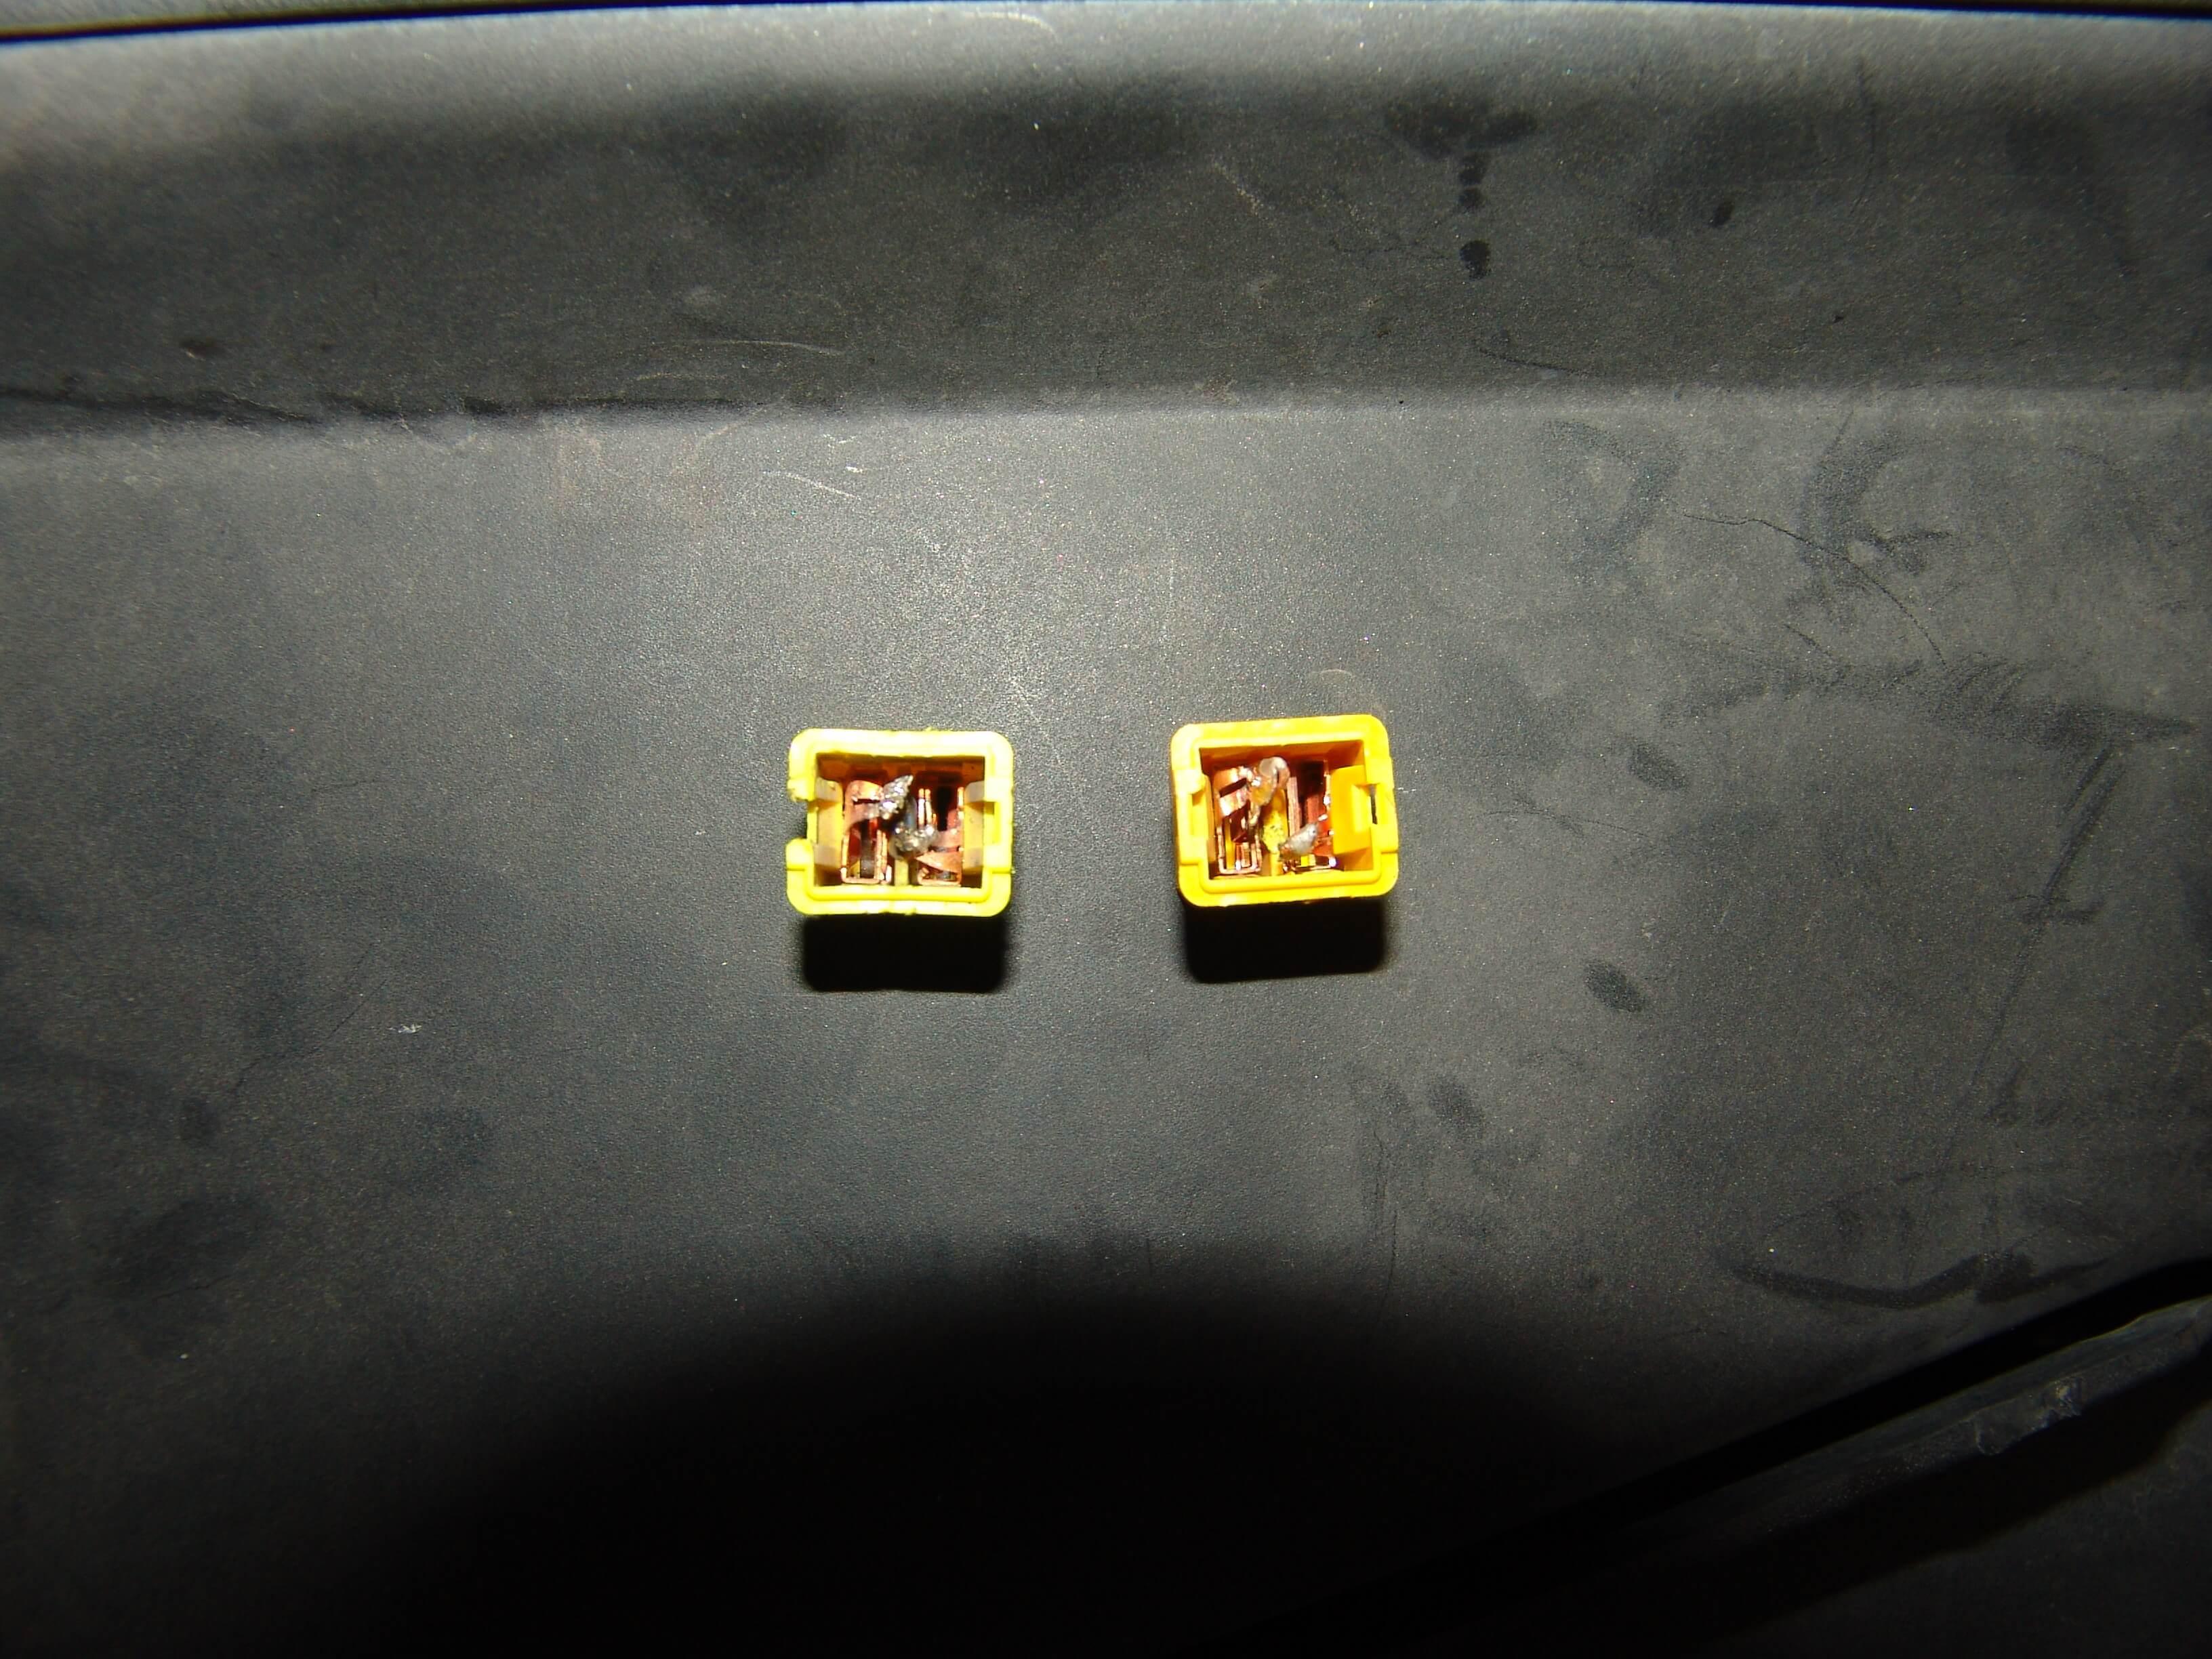 2002 Chevy Tahoe Fuse Box Diagram Car Tuning